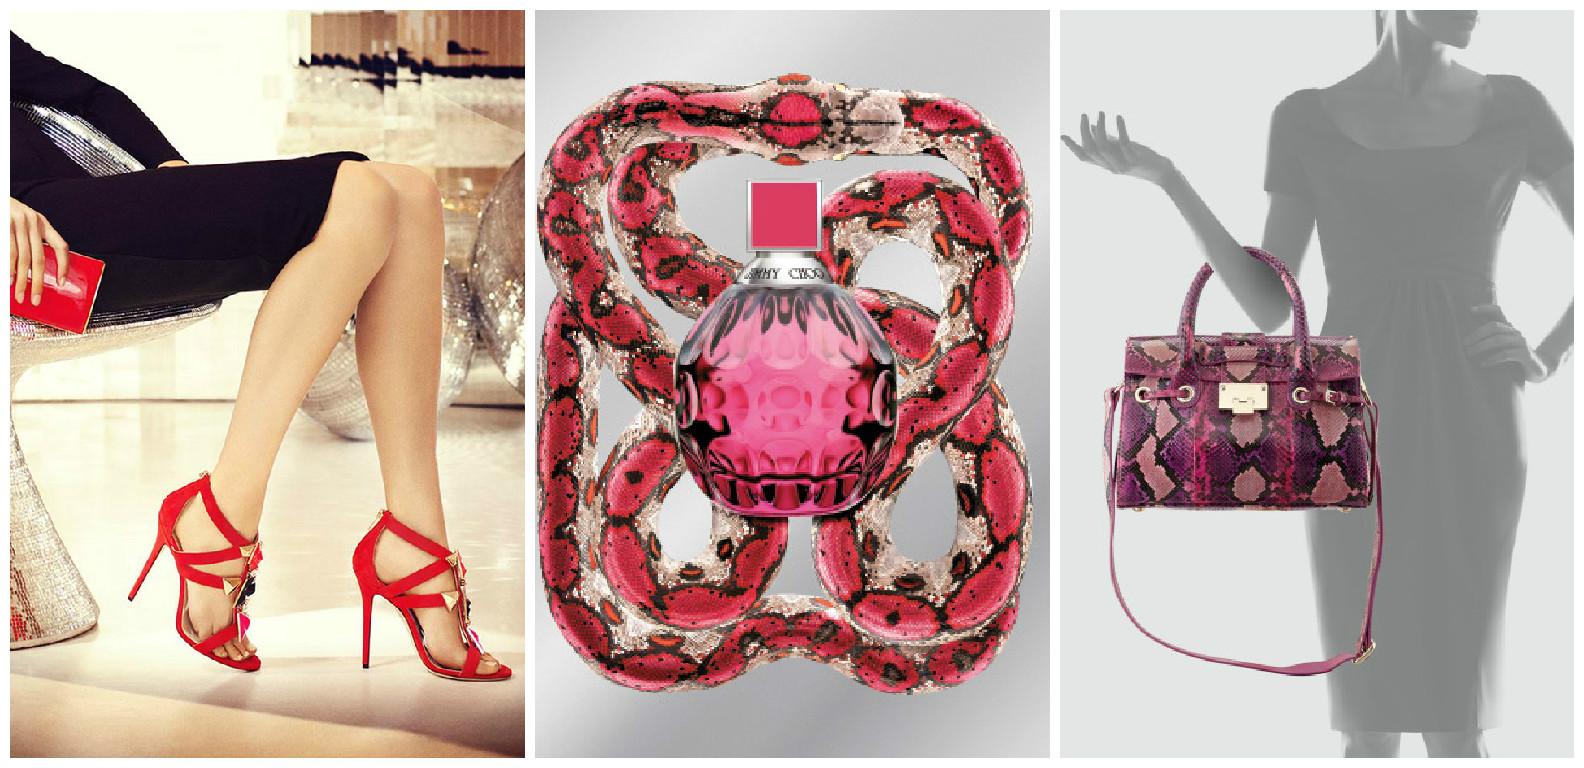 Perfume of the Day: Jimmy Choo Exotic by Jimmy Choo